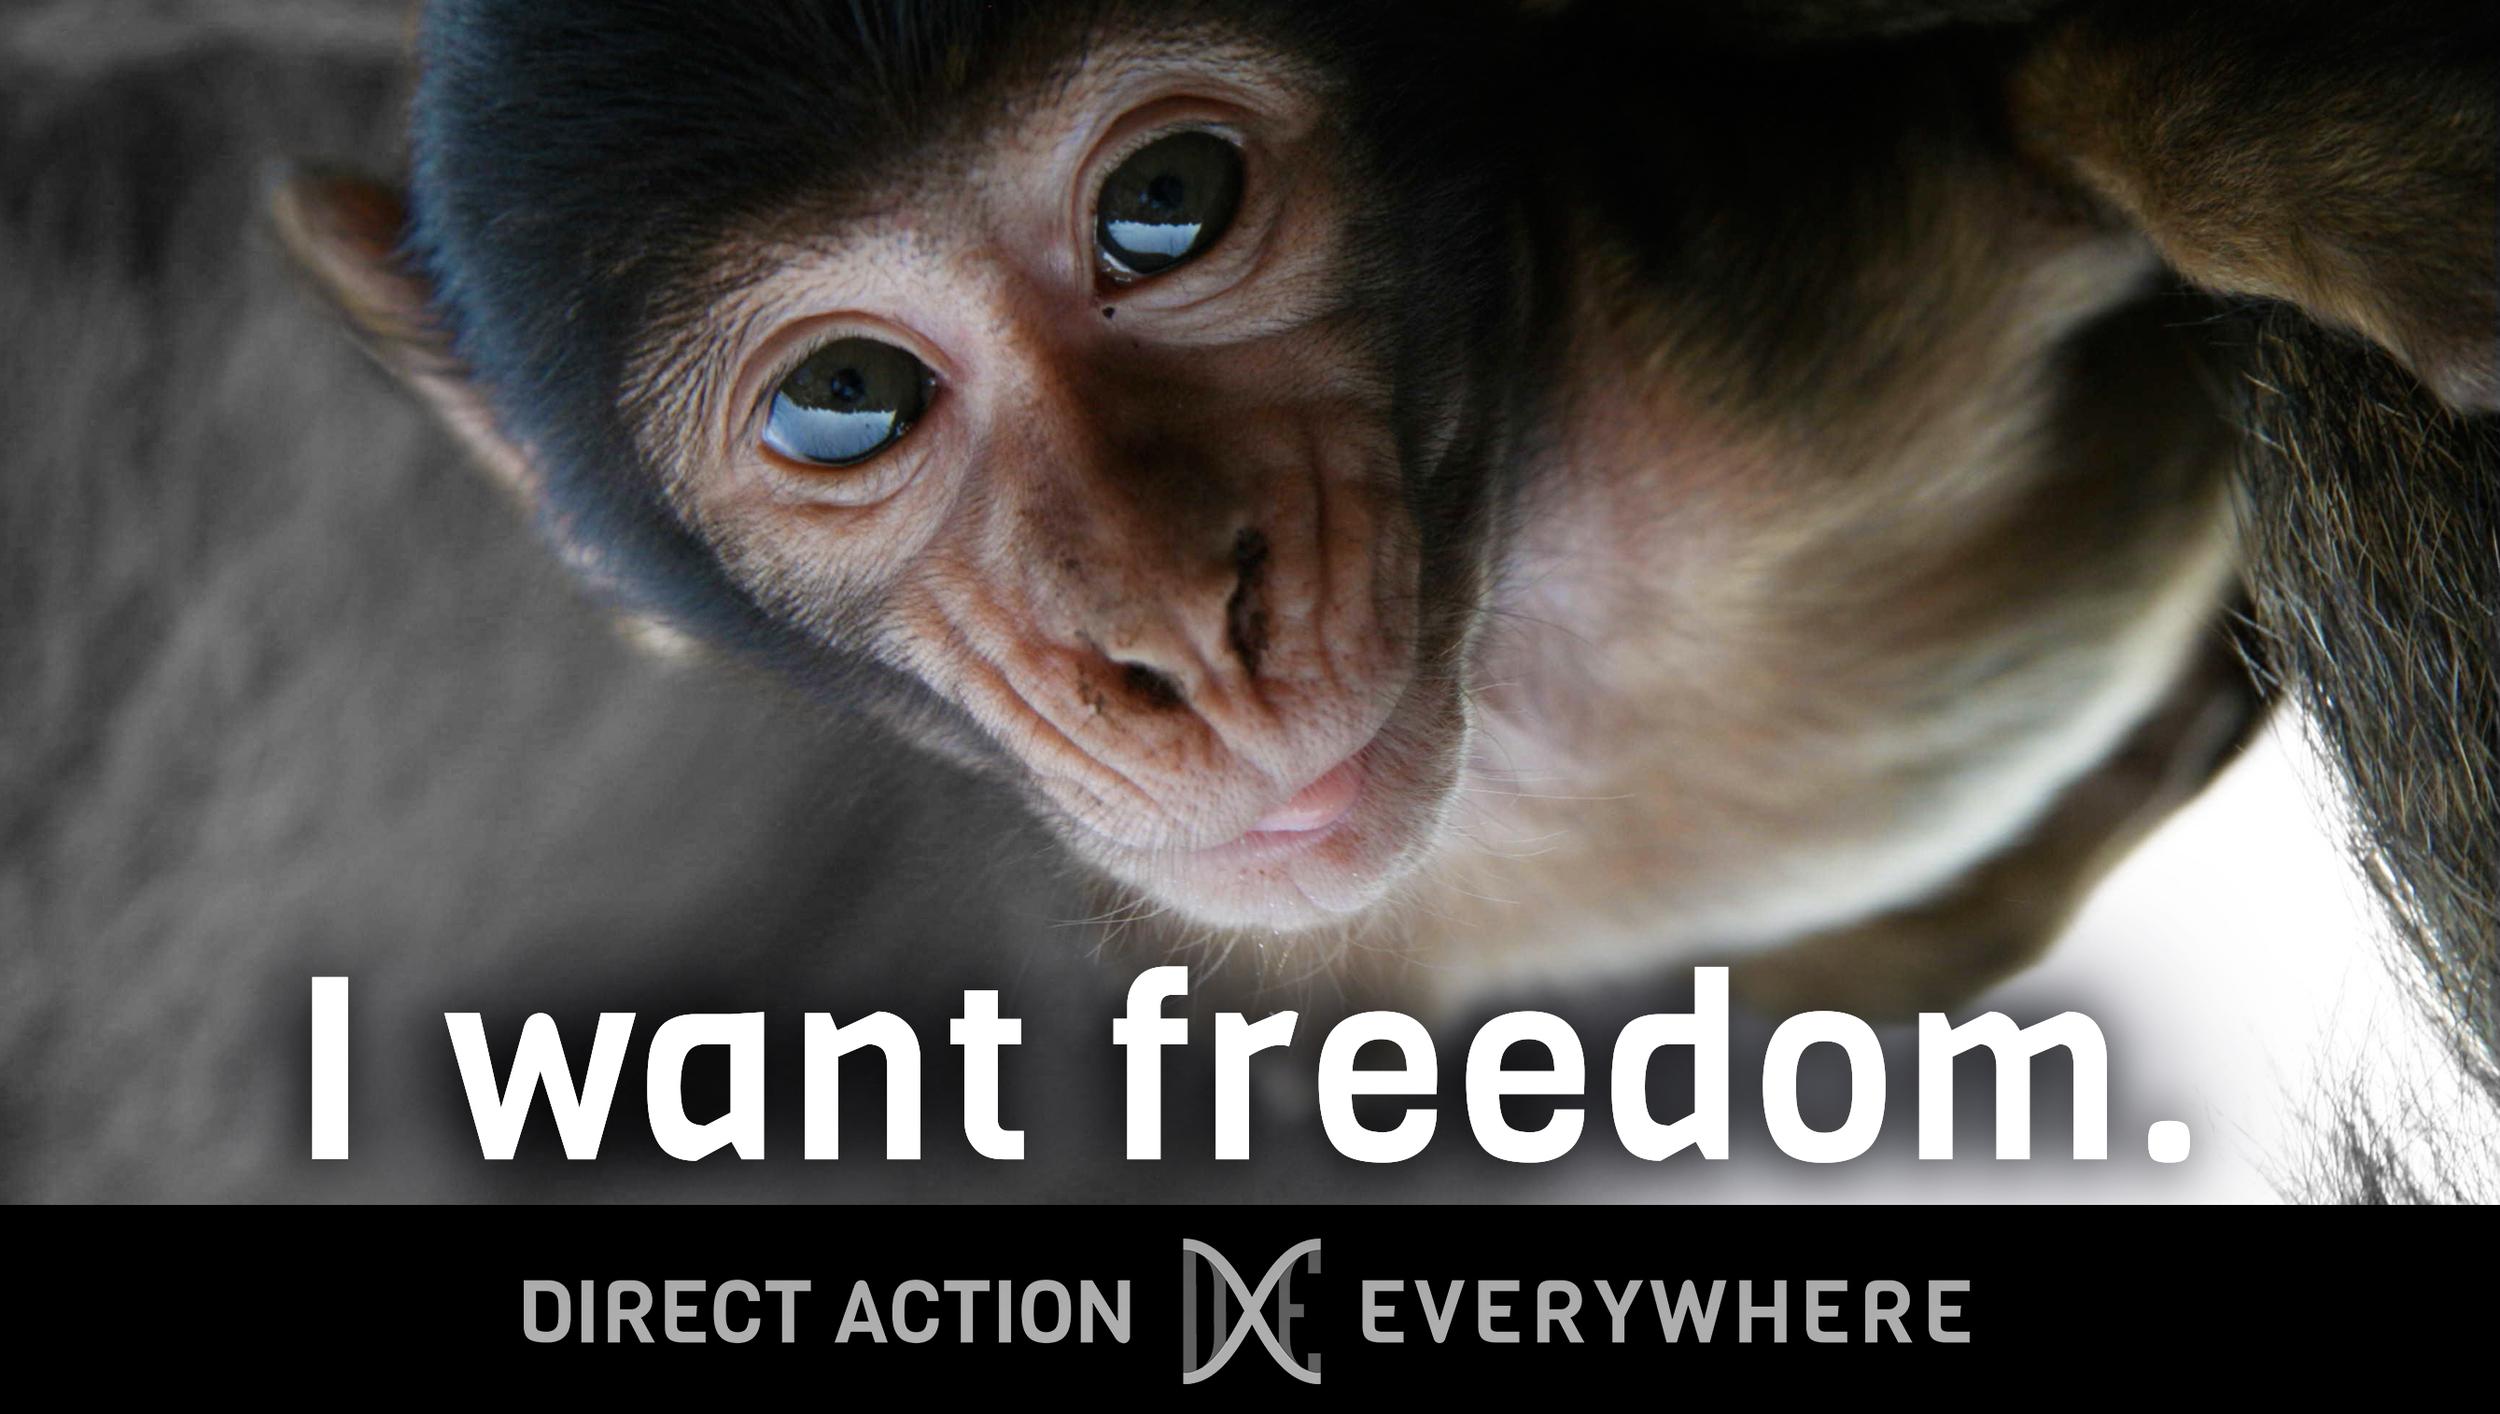 iwantfreedom_monkey.jpg